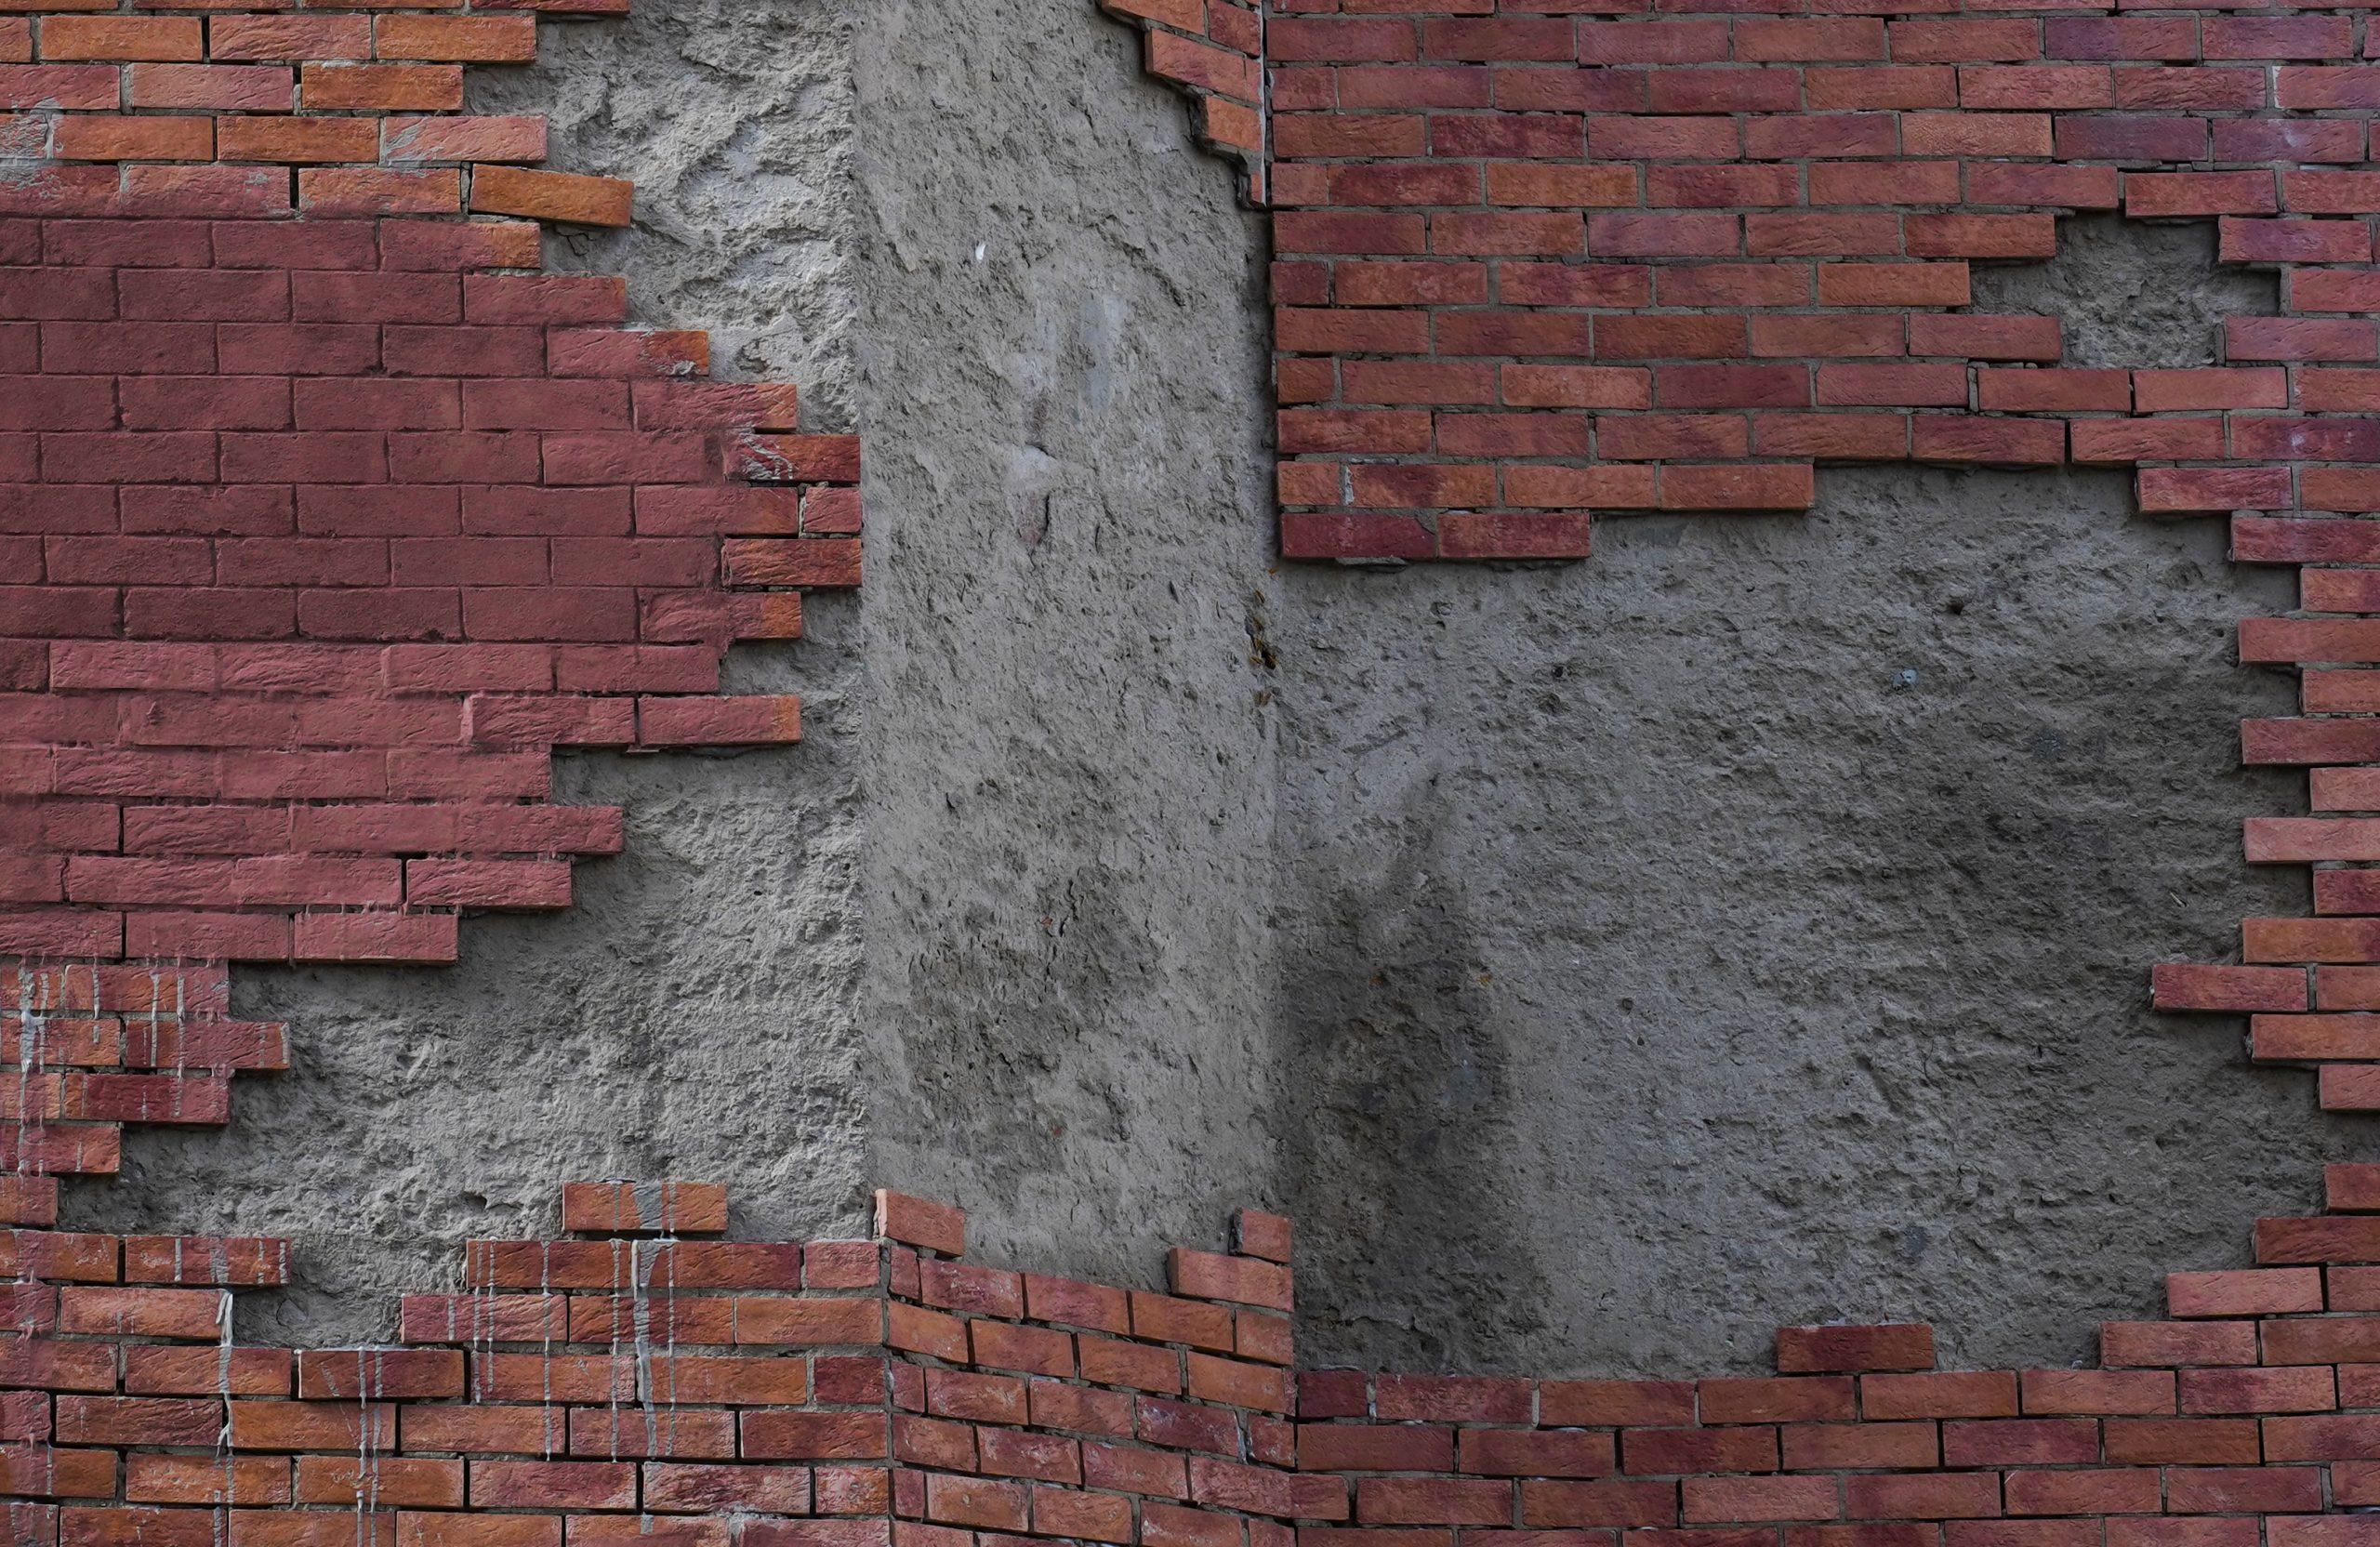 Half build brick wall